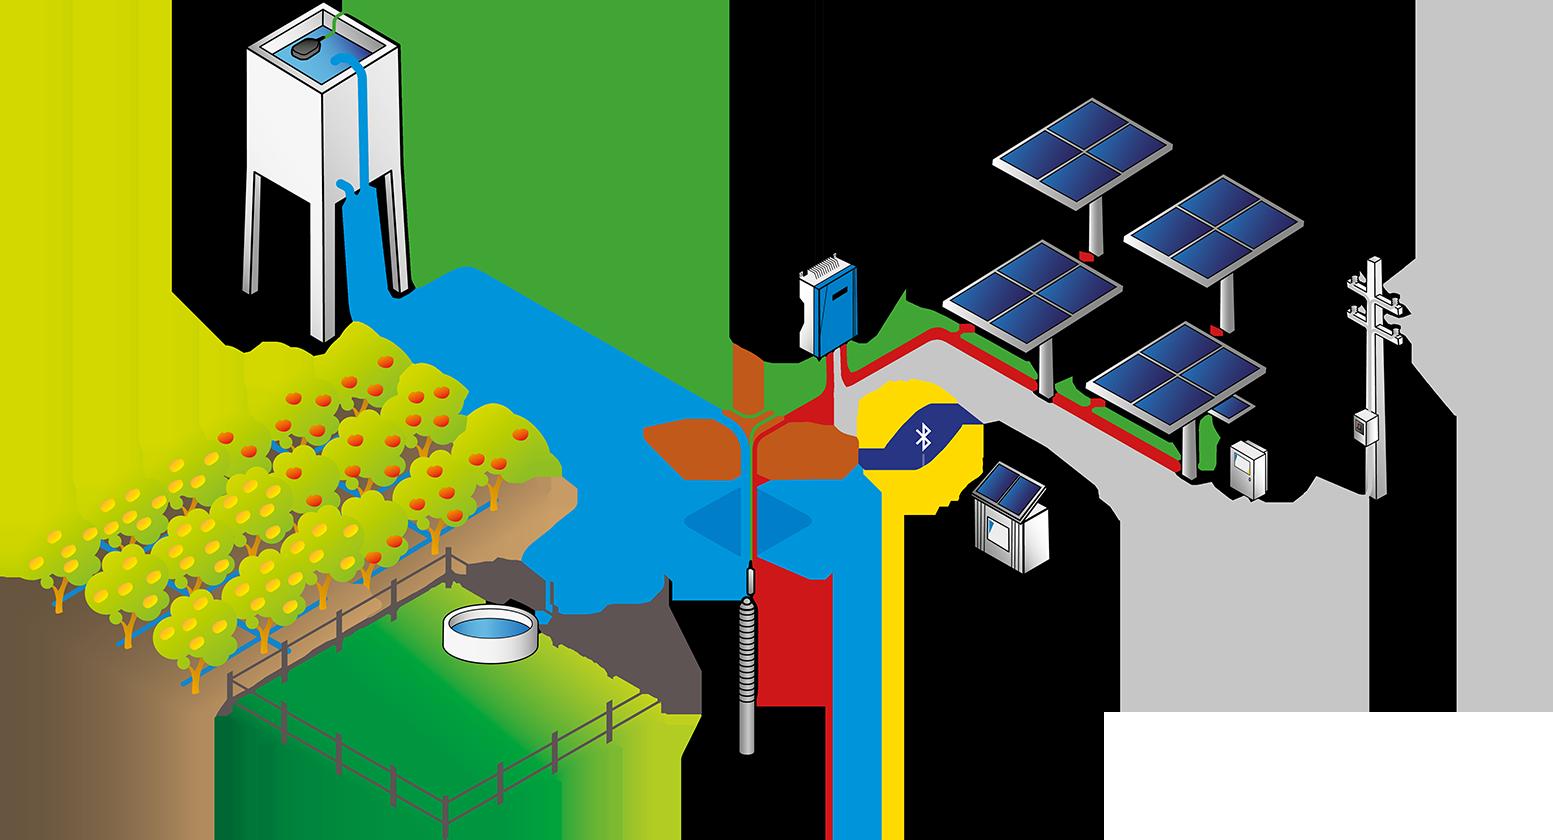 Lorentz PS2 Solar Water Pump System Layout